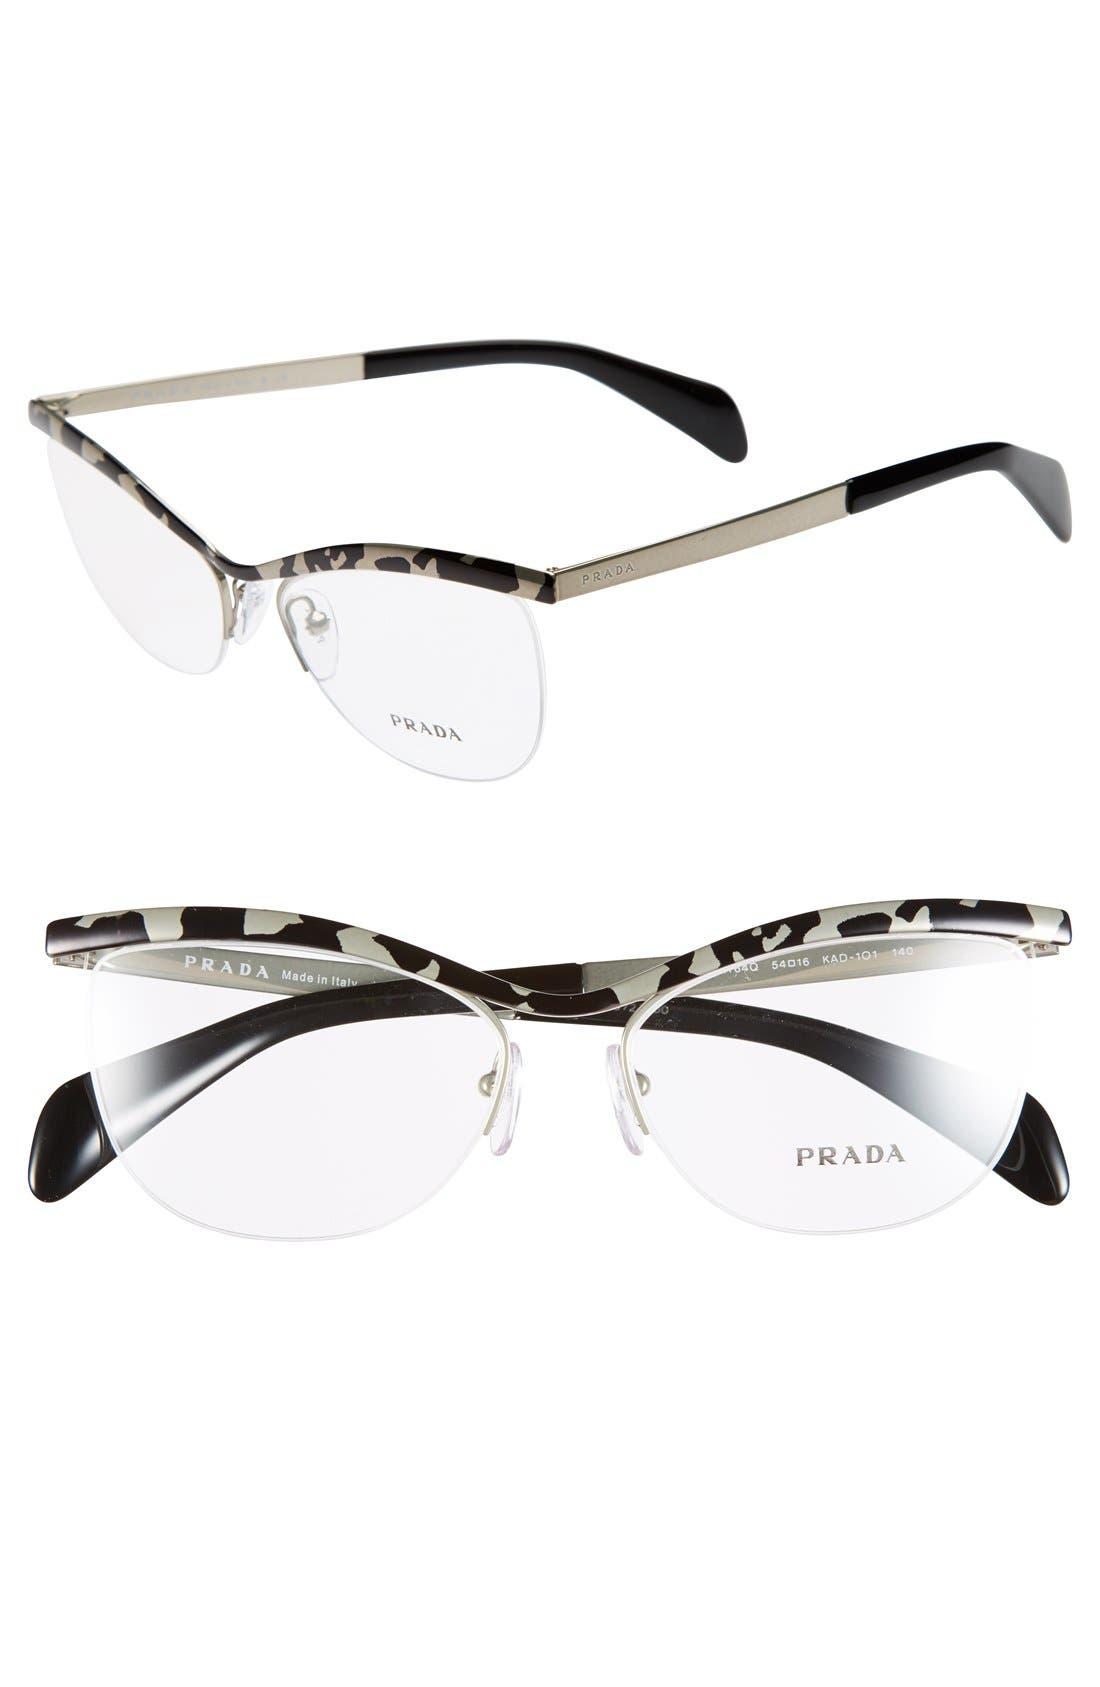 Main Image - Prada 54mm Optical Glasses (Online Only)